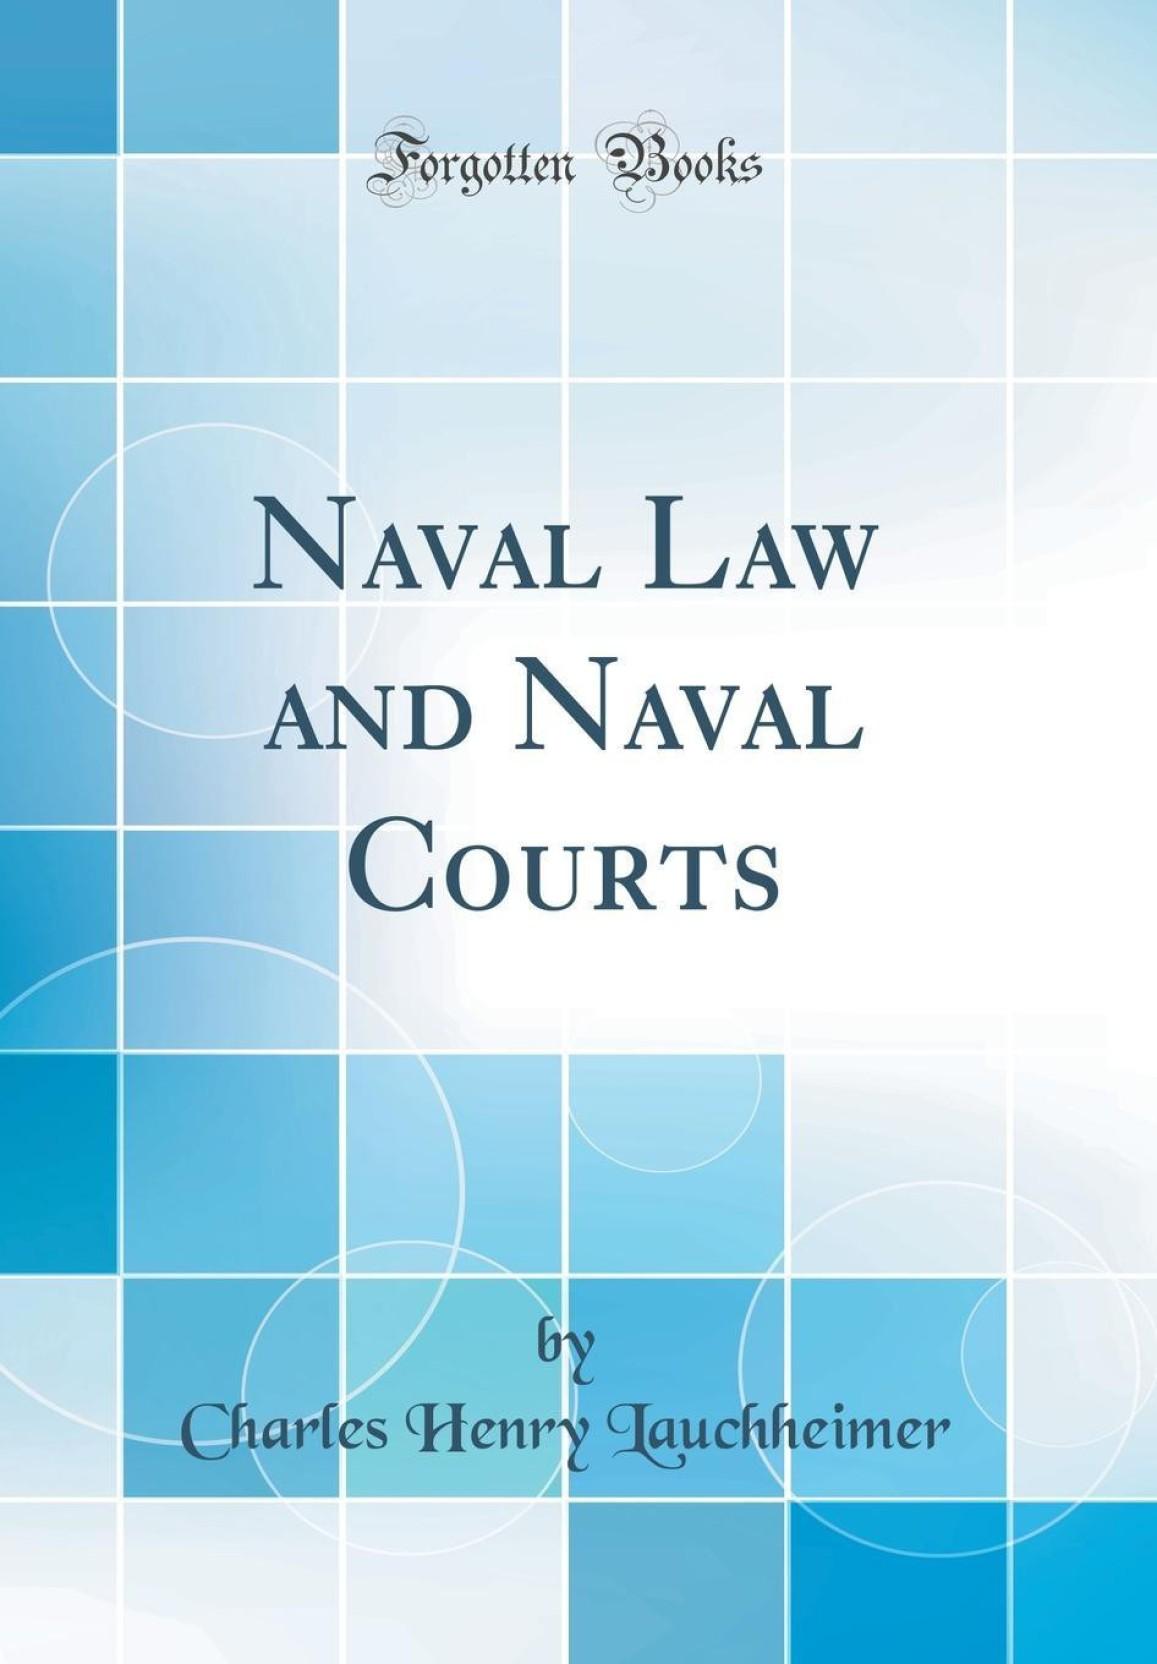 naval law